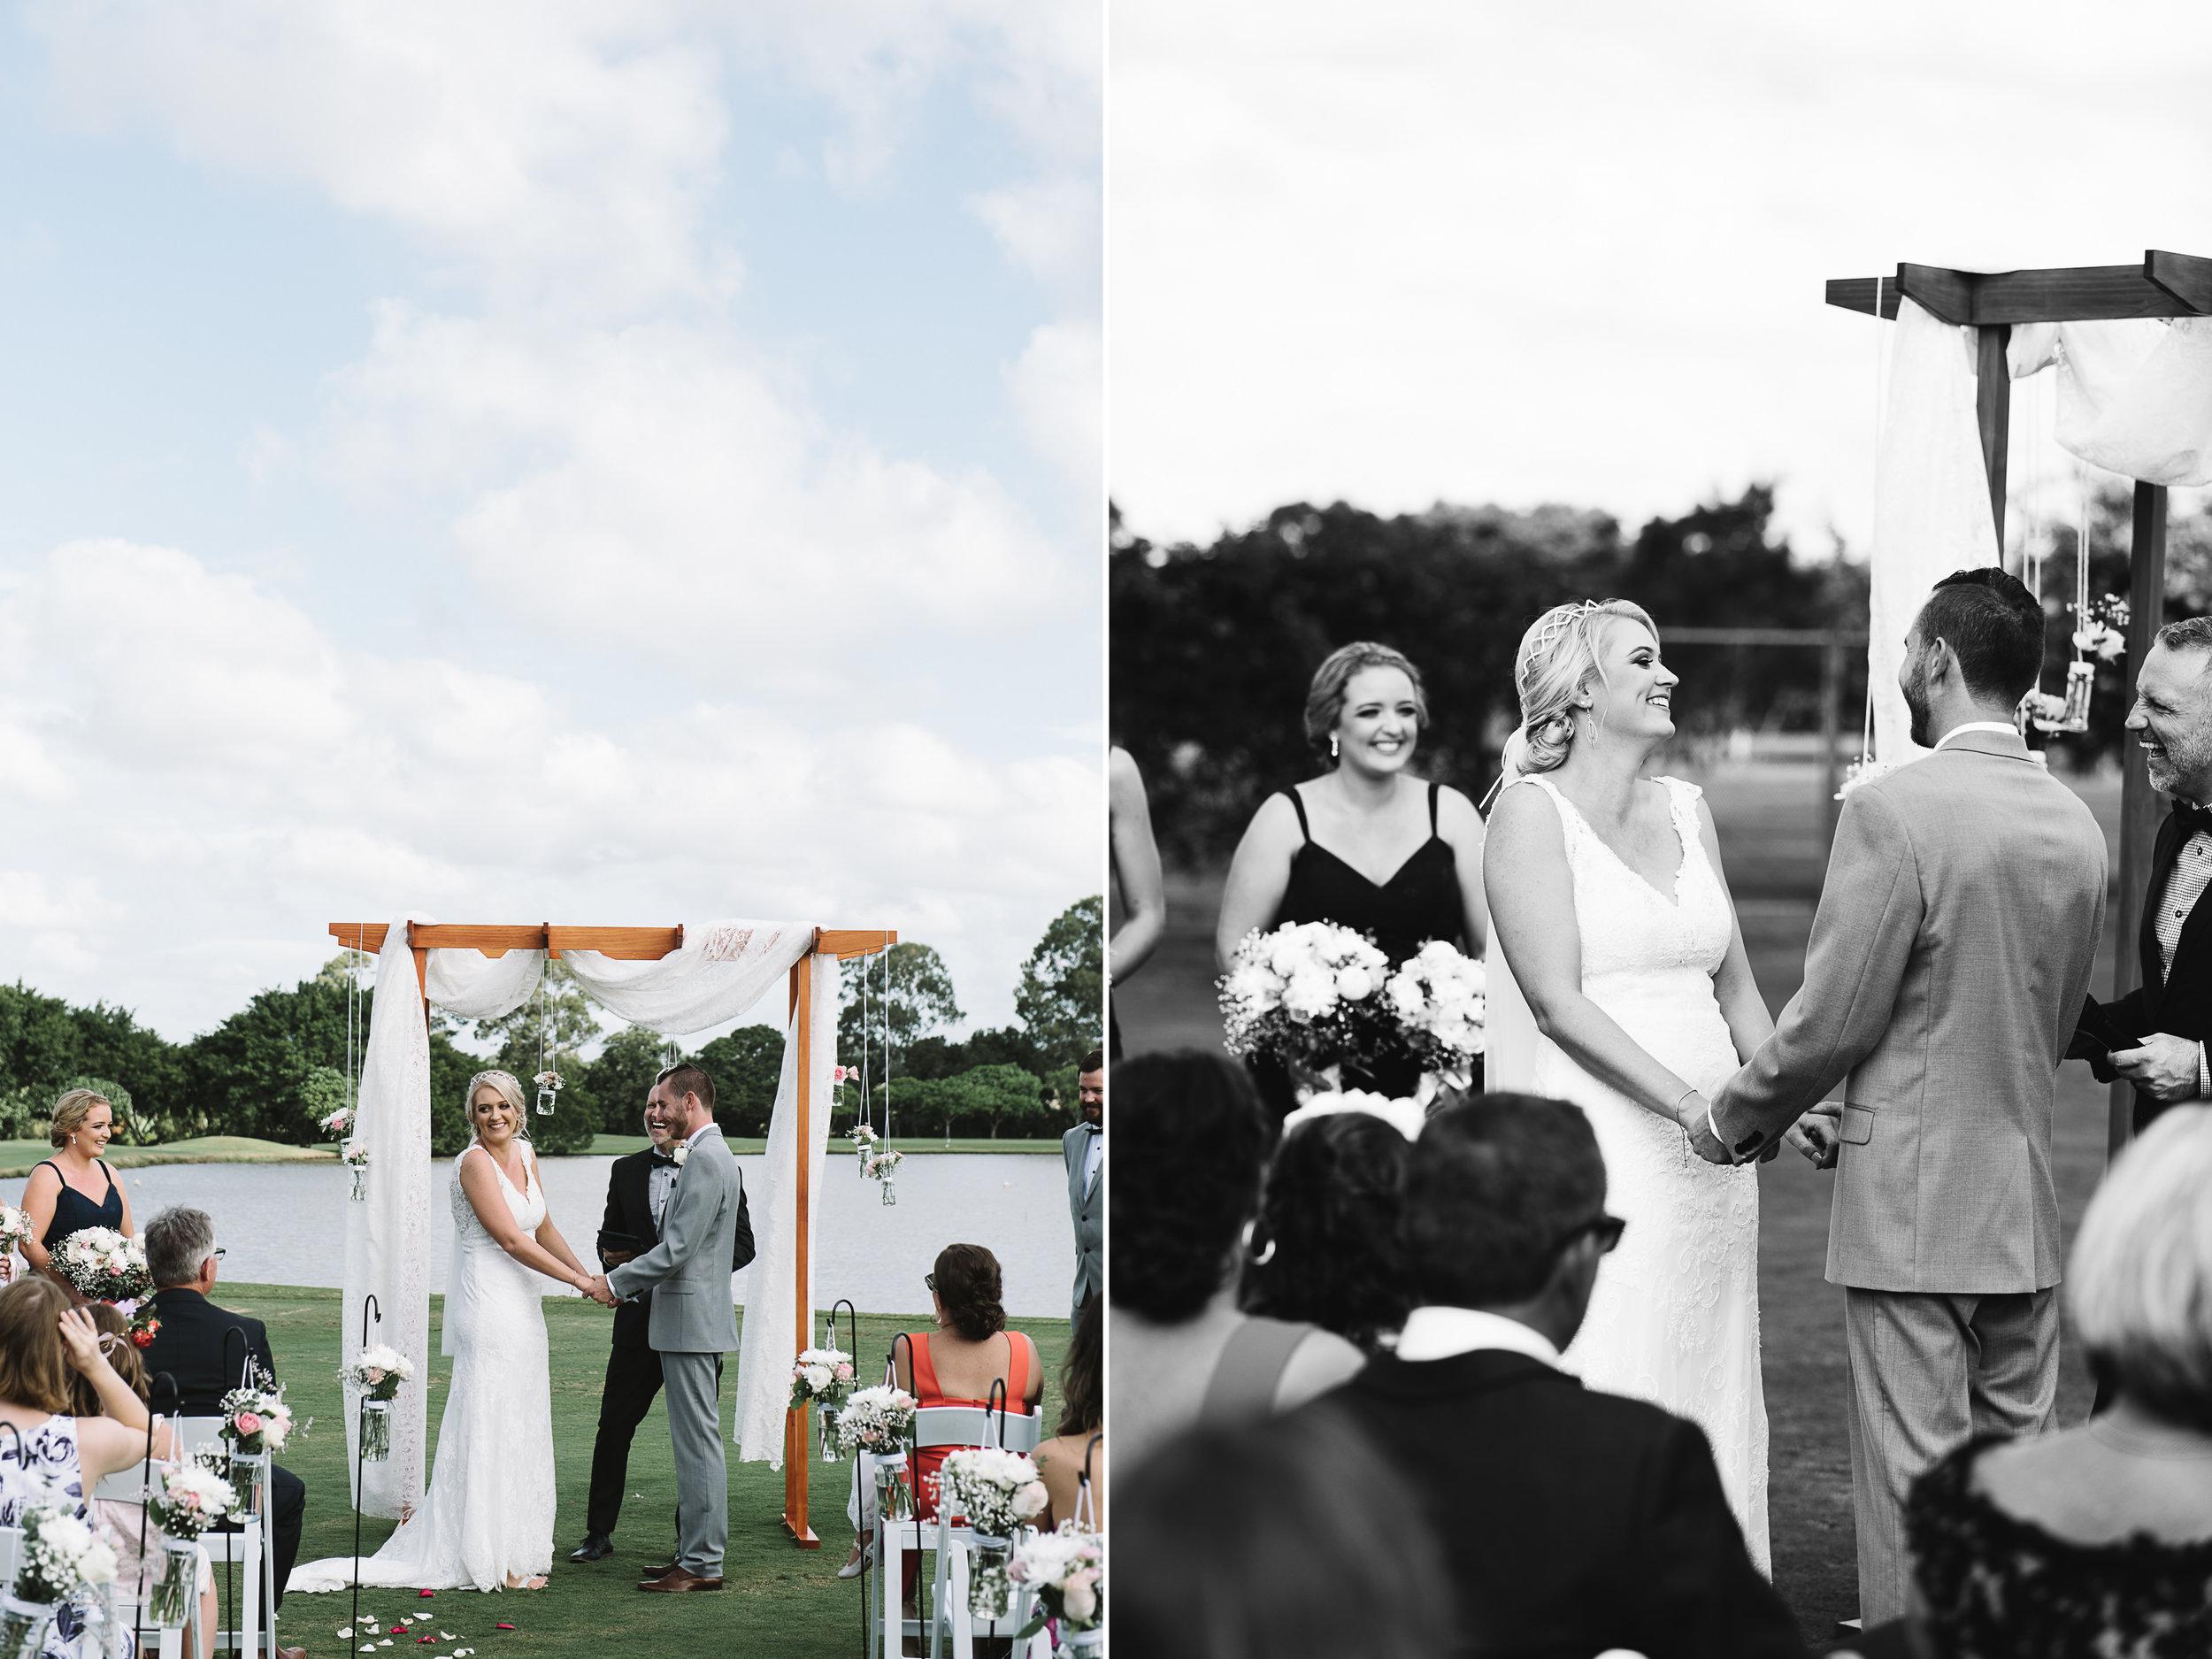 Brisbane-wedding-photography-18.jpg